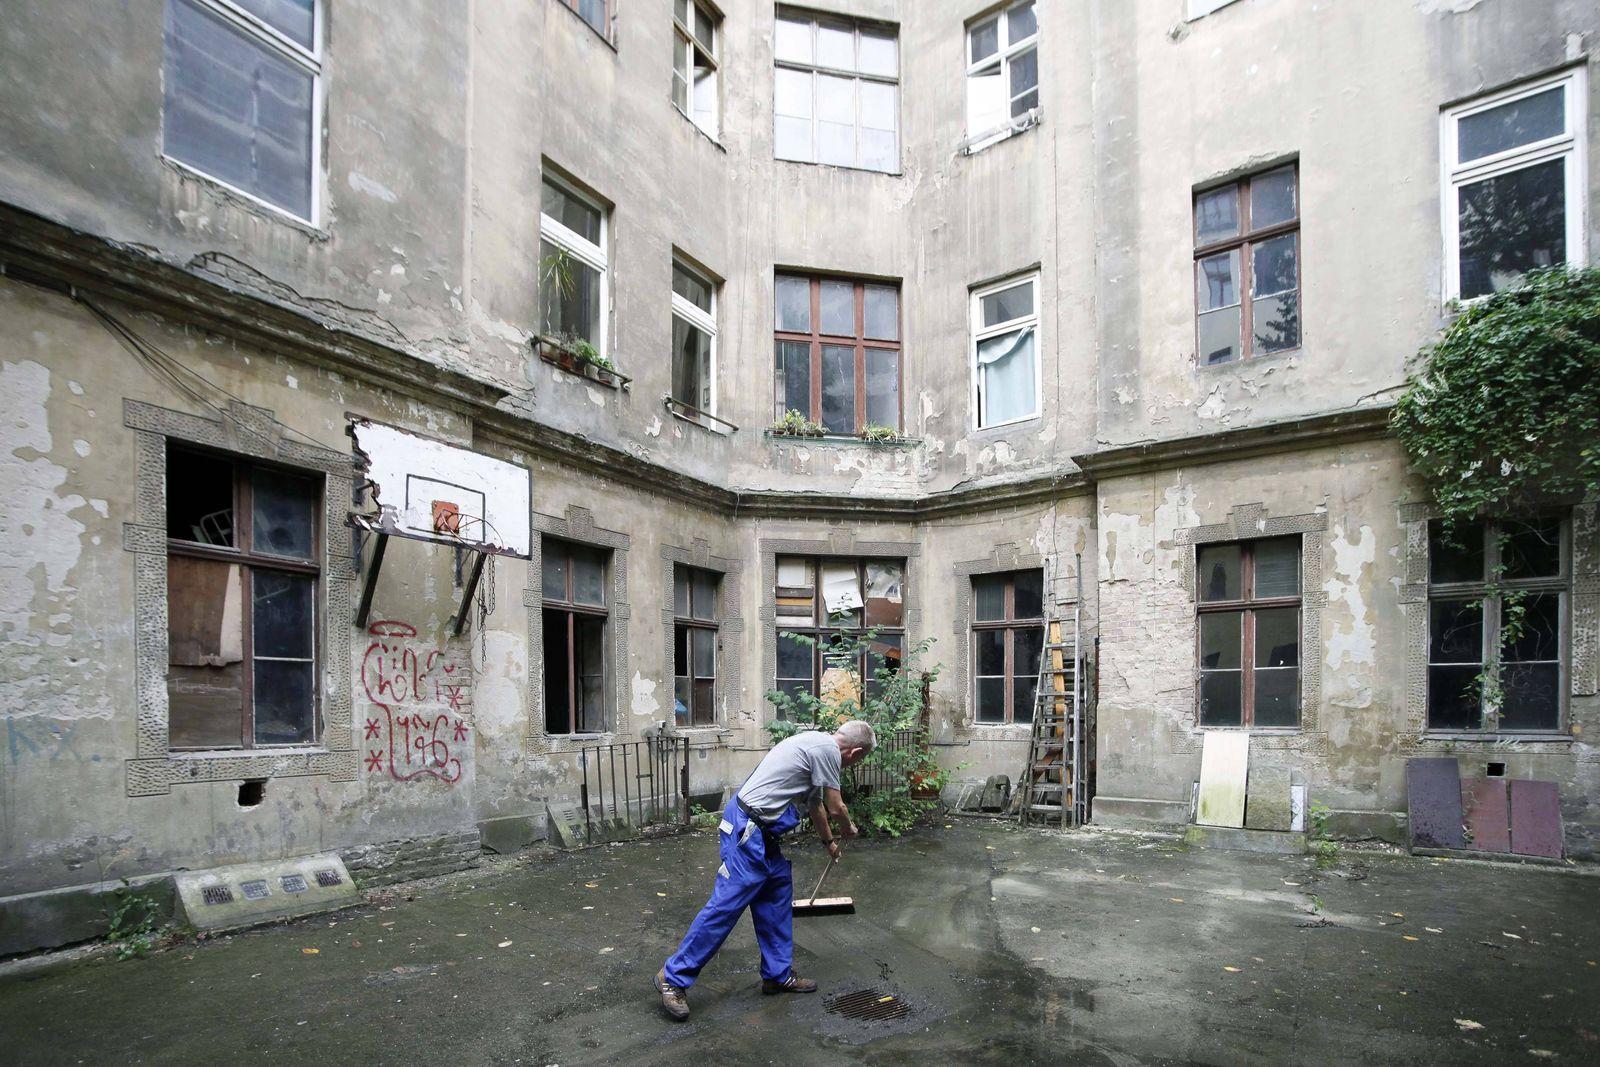 Berlin / Verfall / Heruntergekommen